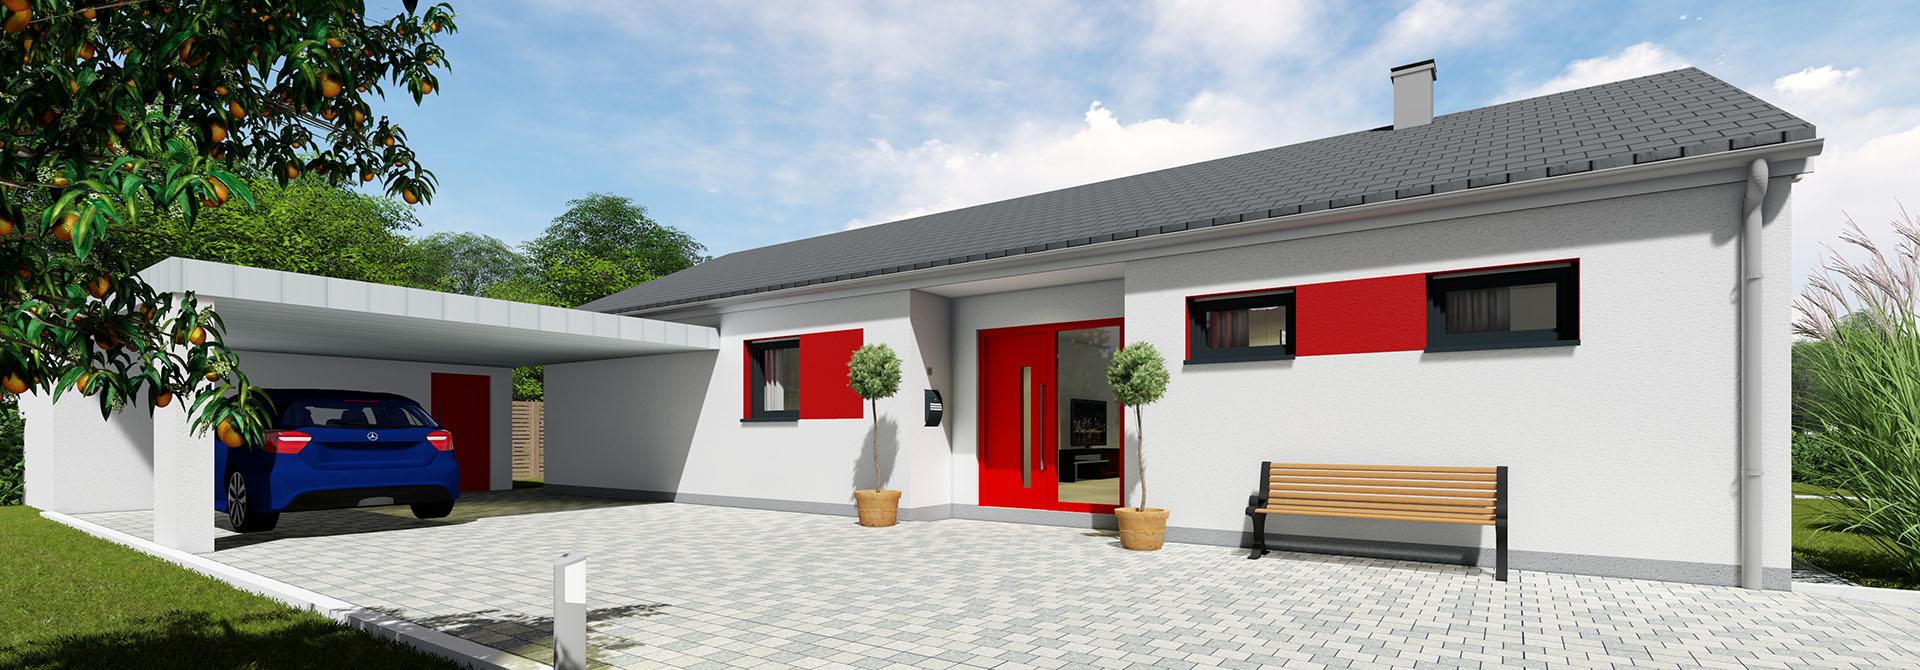 bungalow rs individuelles bauen gmbh. Black Bedroom Furniture Sets. Home Design Ideas